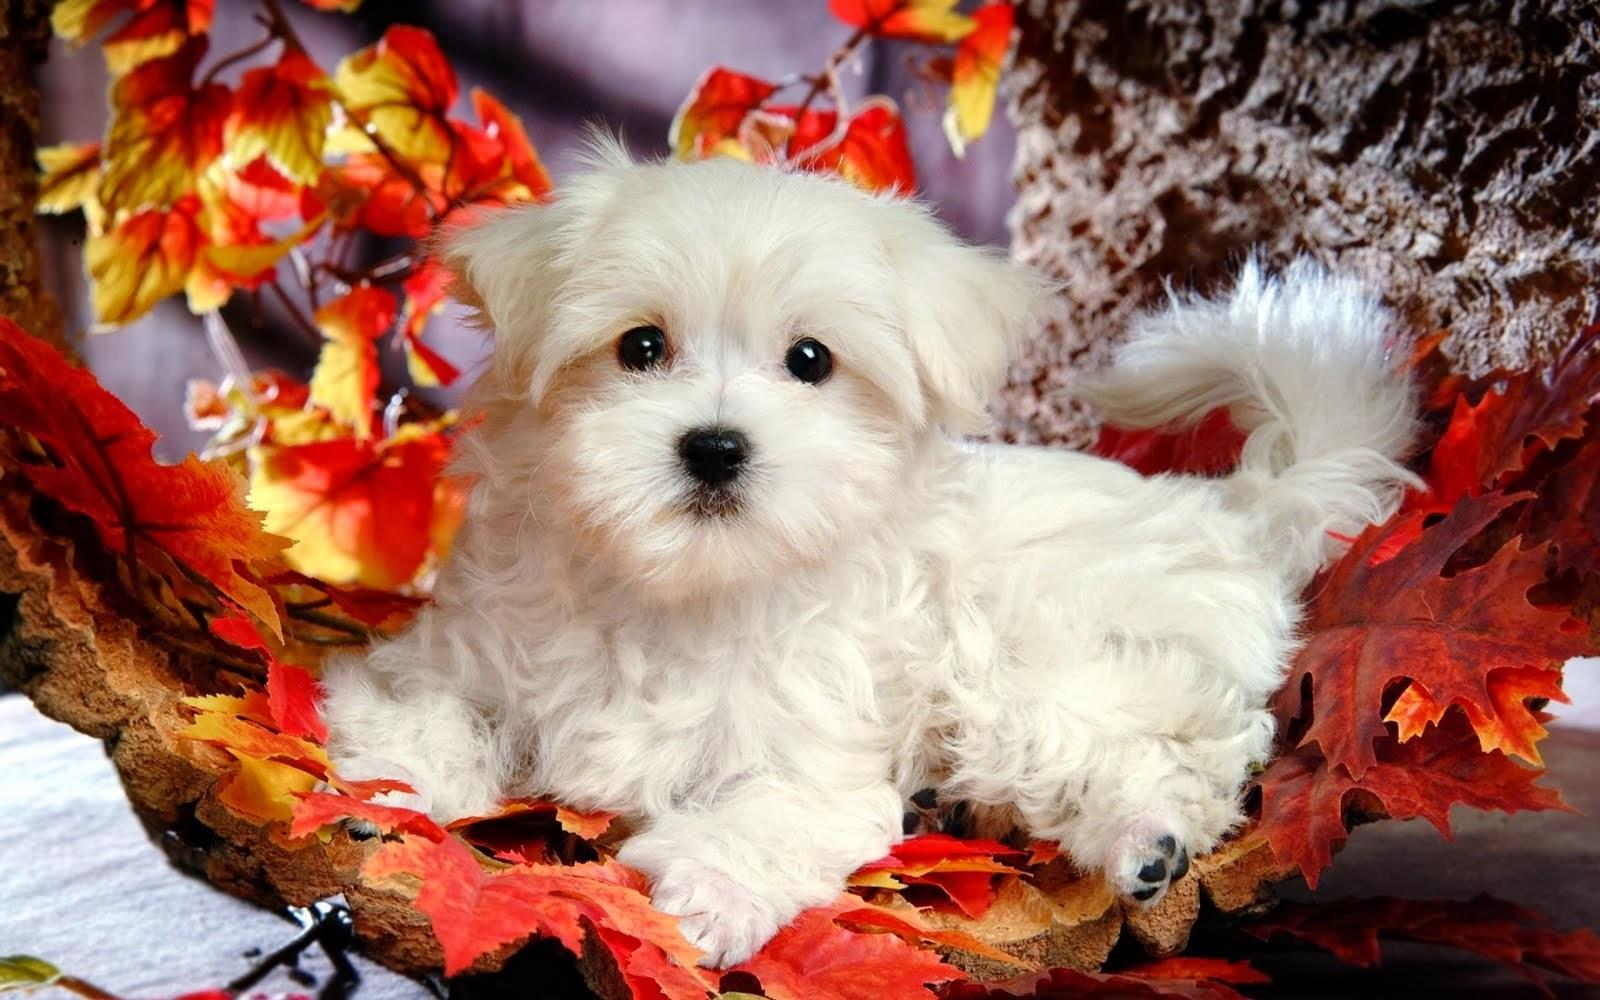 Beautiful Cute Puppies Wallpapers Free Hd Desktop Wallpapers Download